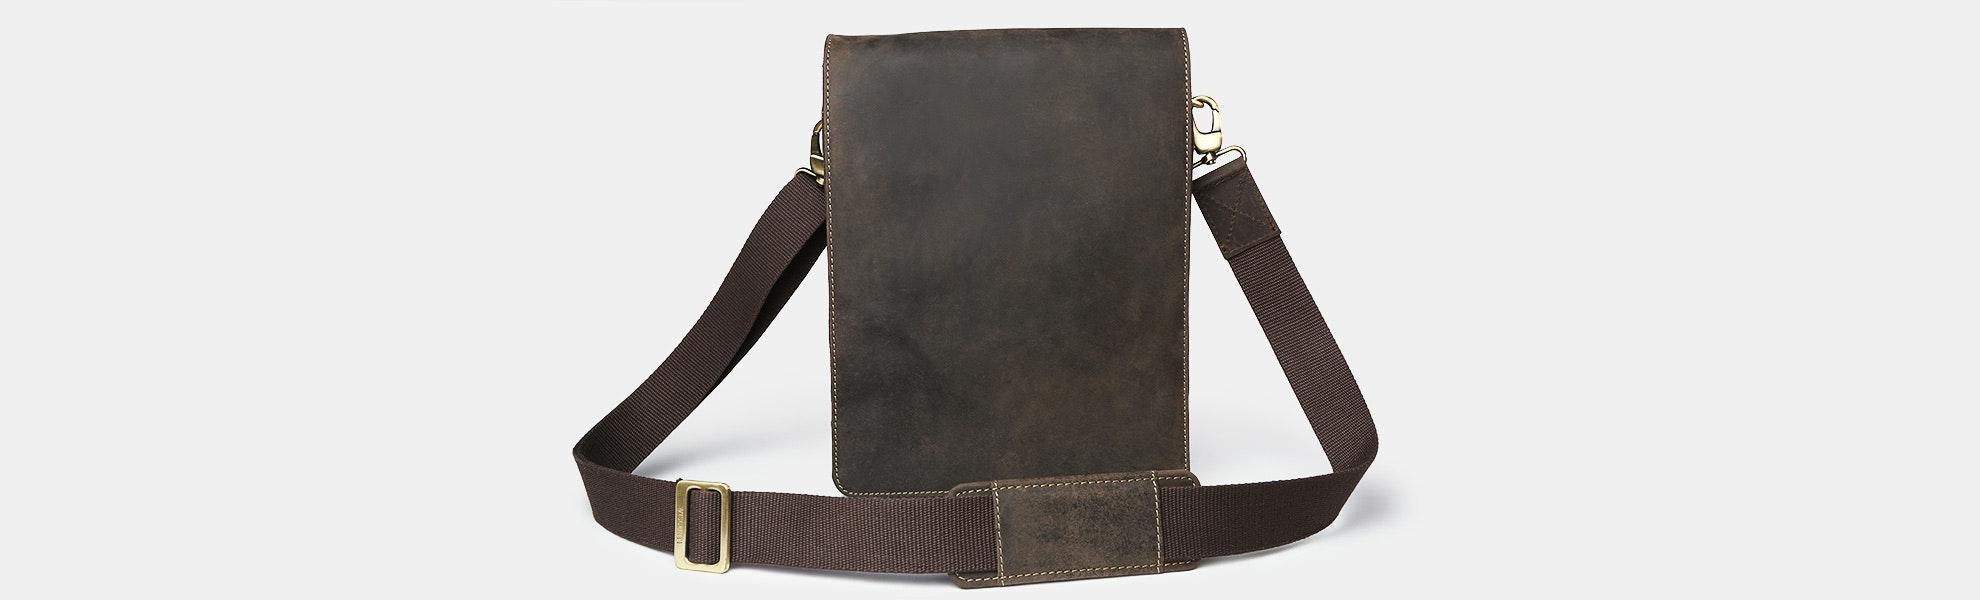 Visconti Leather Leo Messenger Bag